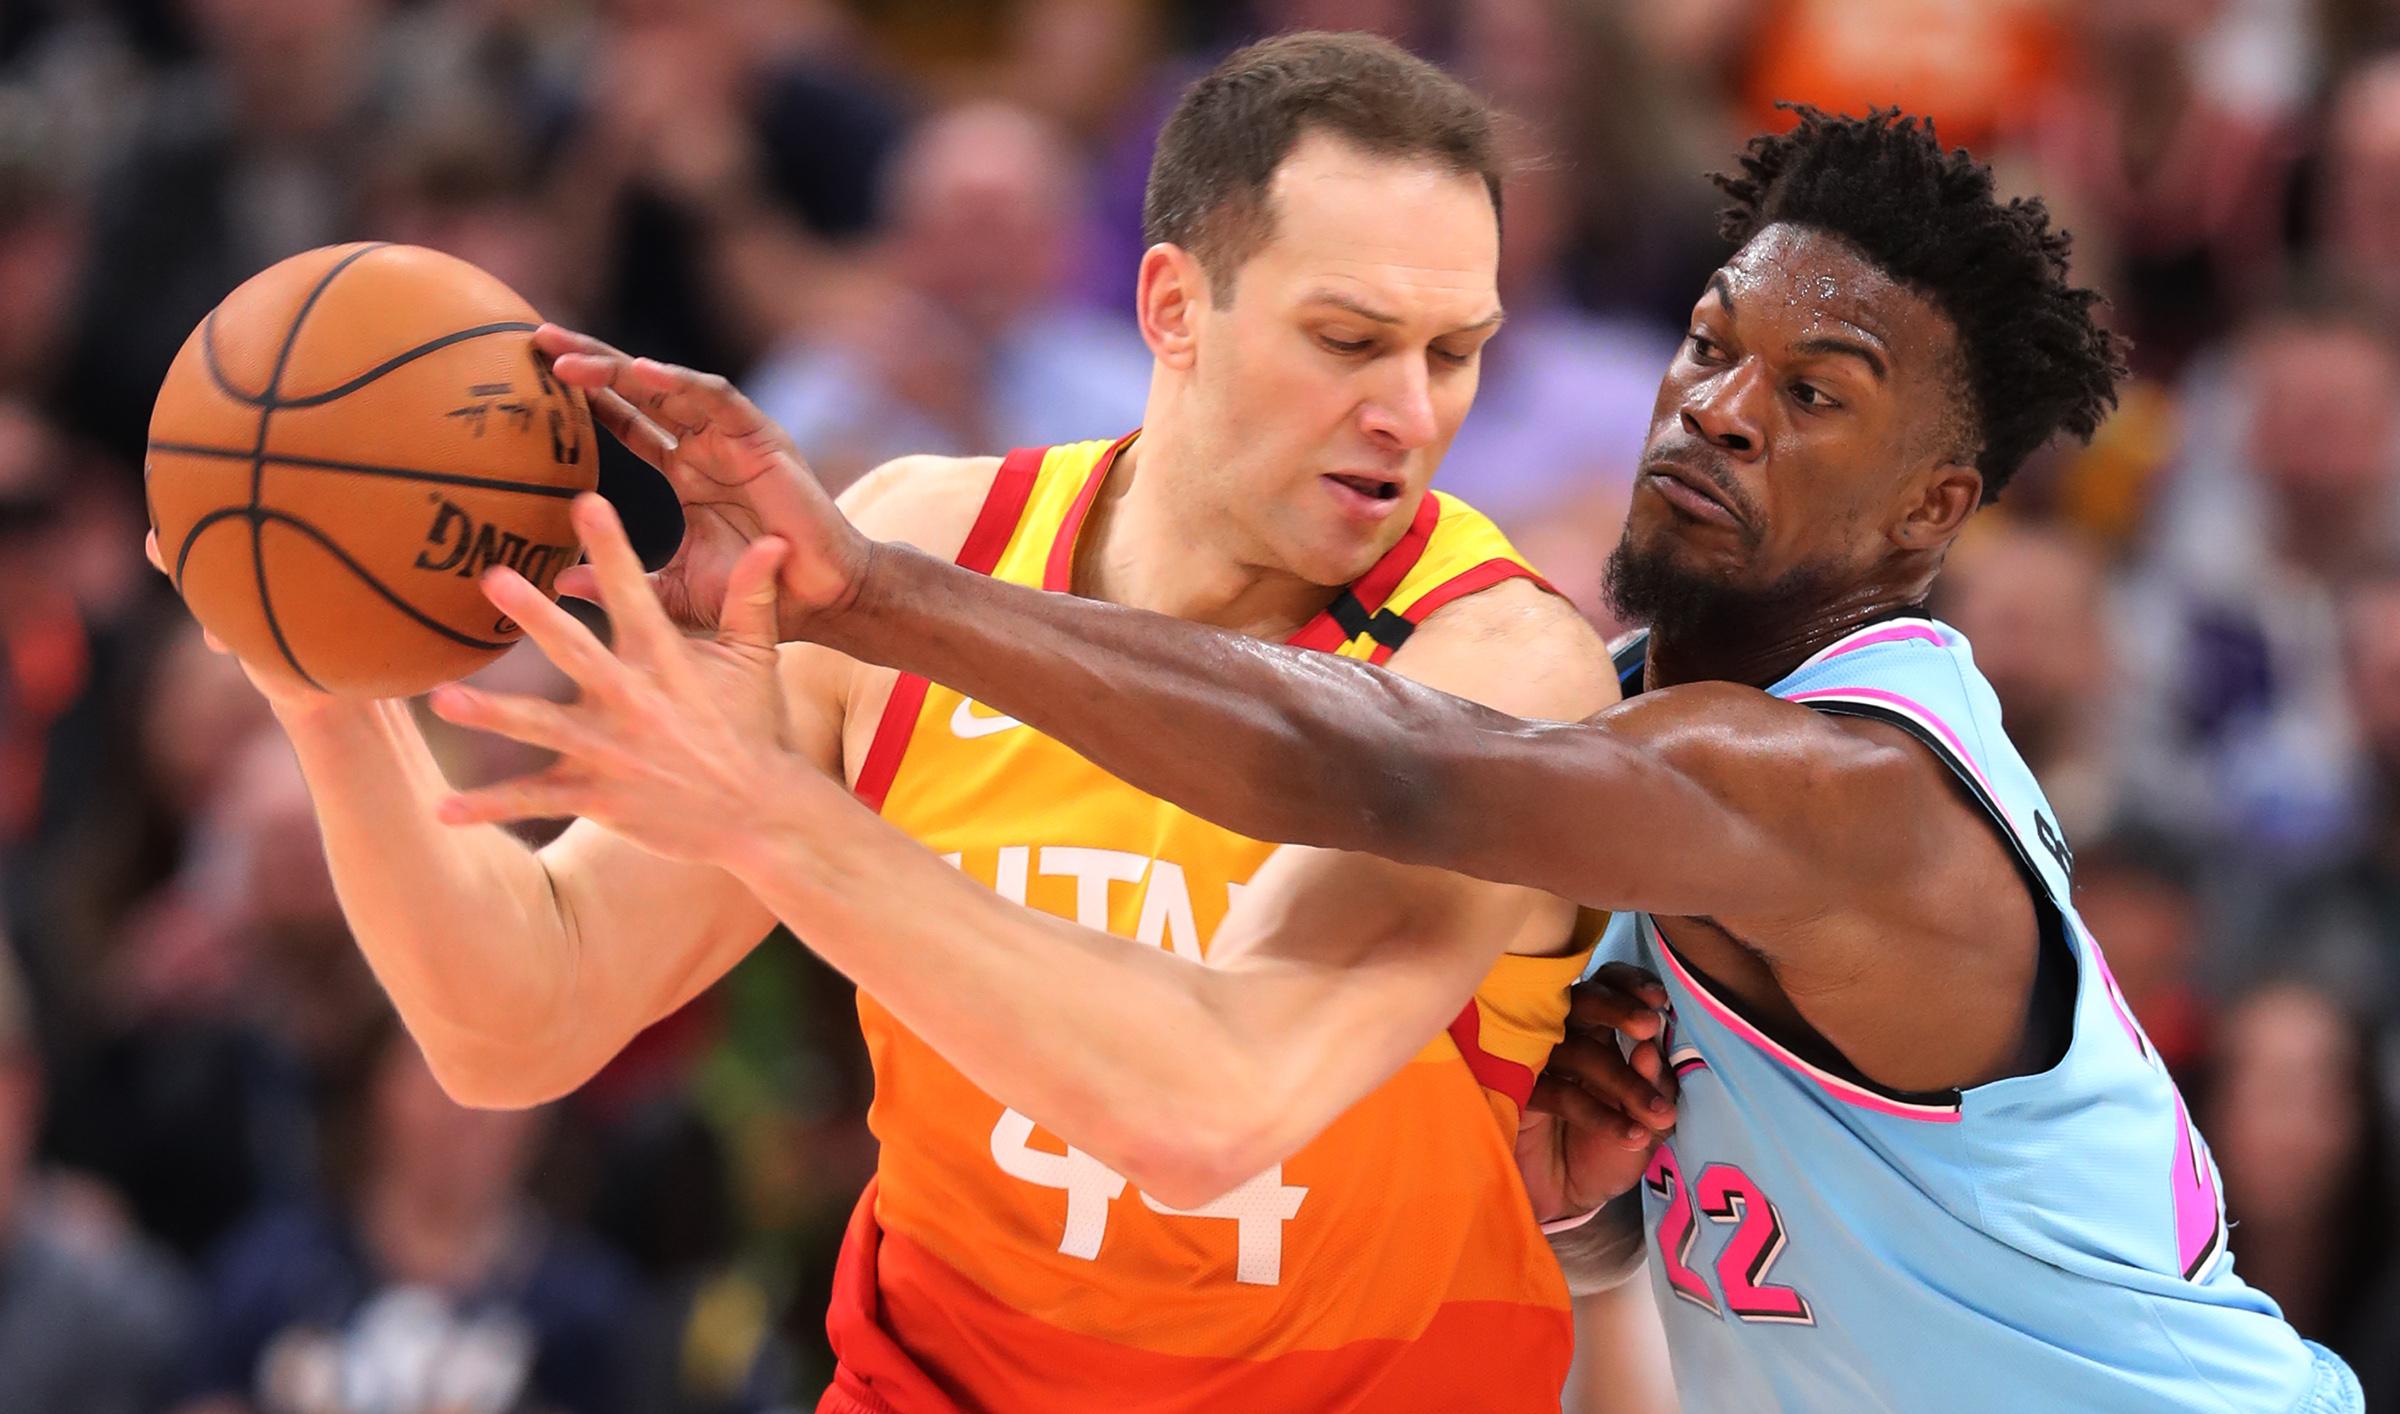 Utah Jazz forward Bojan Bogdanovic (44) works to keep Miami Heat forward Jimmy Butler (22) away from the ball as the Utah Jazz and the Miami Heat play in an NBA basketball game at Vivint Smart Home Arena in Salt Lake City on Wednesday, Feb. 12, 2020. Utah won 116-101.